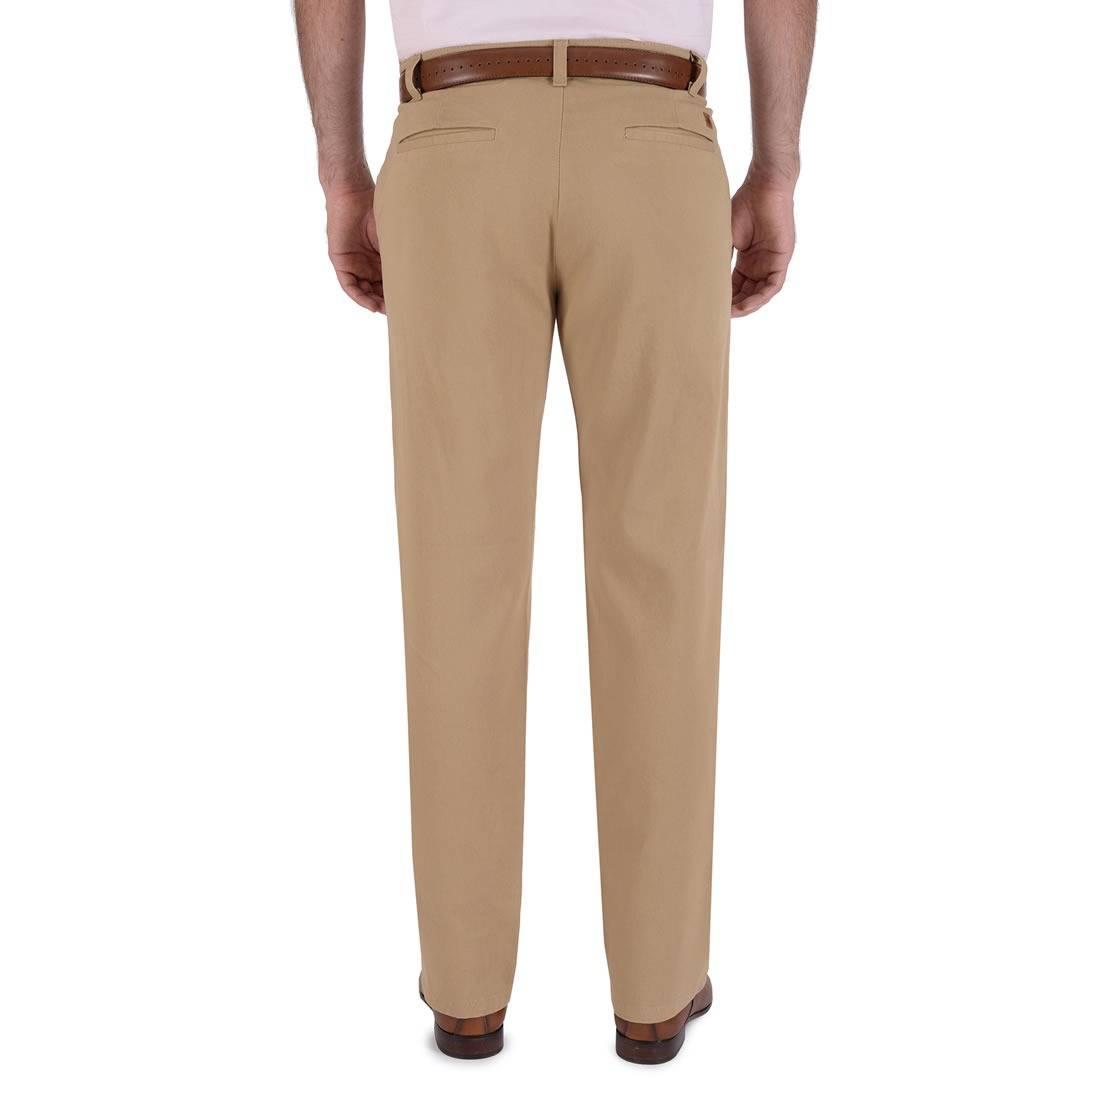 010811074467-02-Pantalon-Casual-Sin-Pinzas-Classic-Fit-Kaki-yale